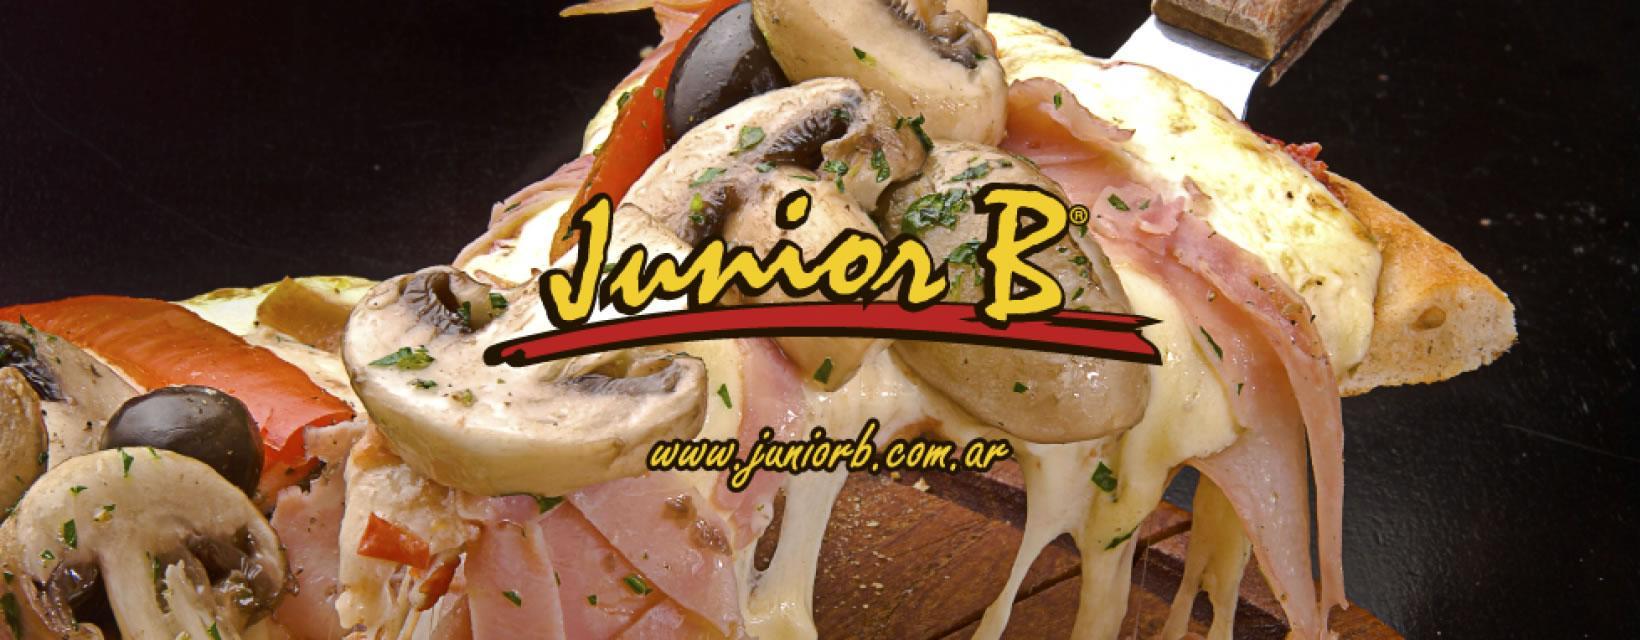 Junior B BANNER